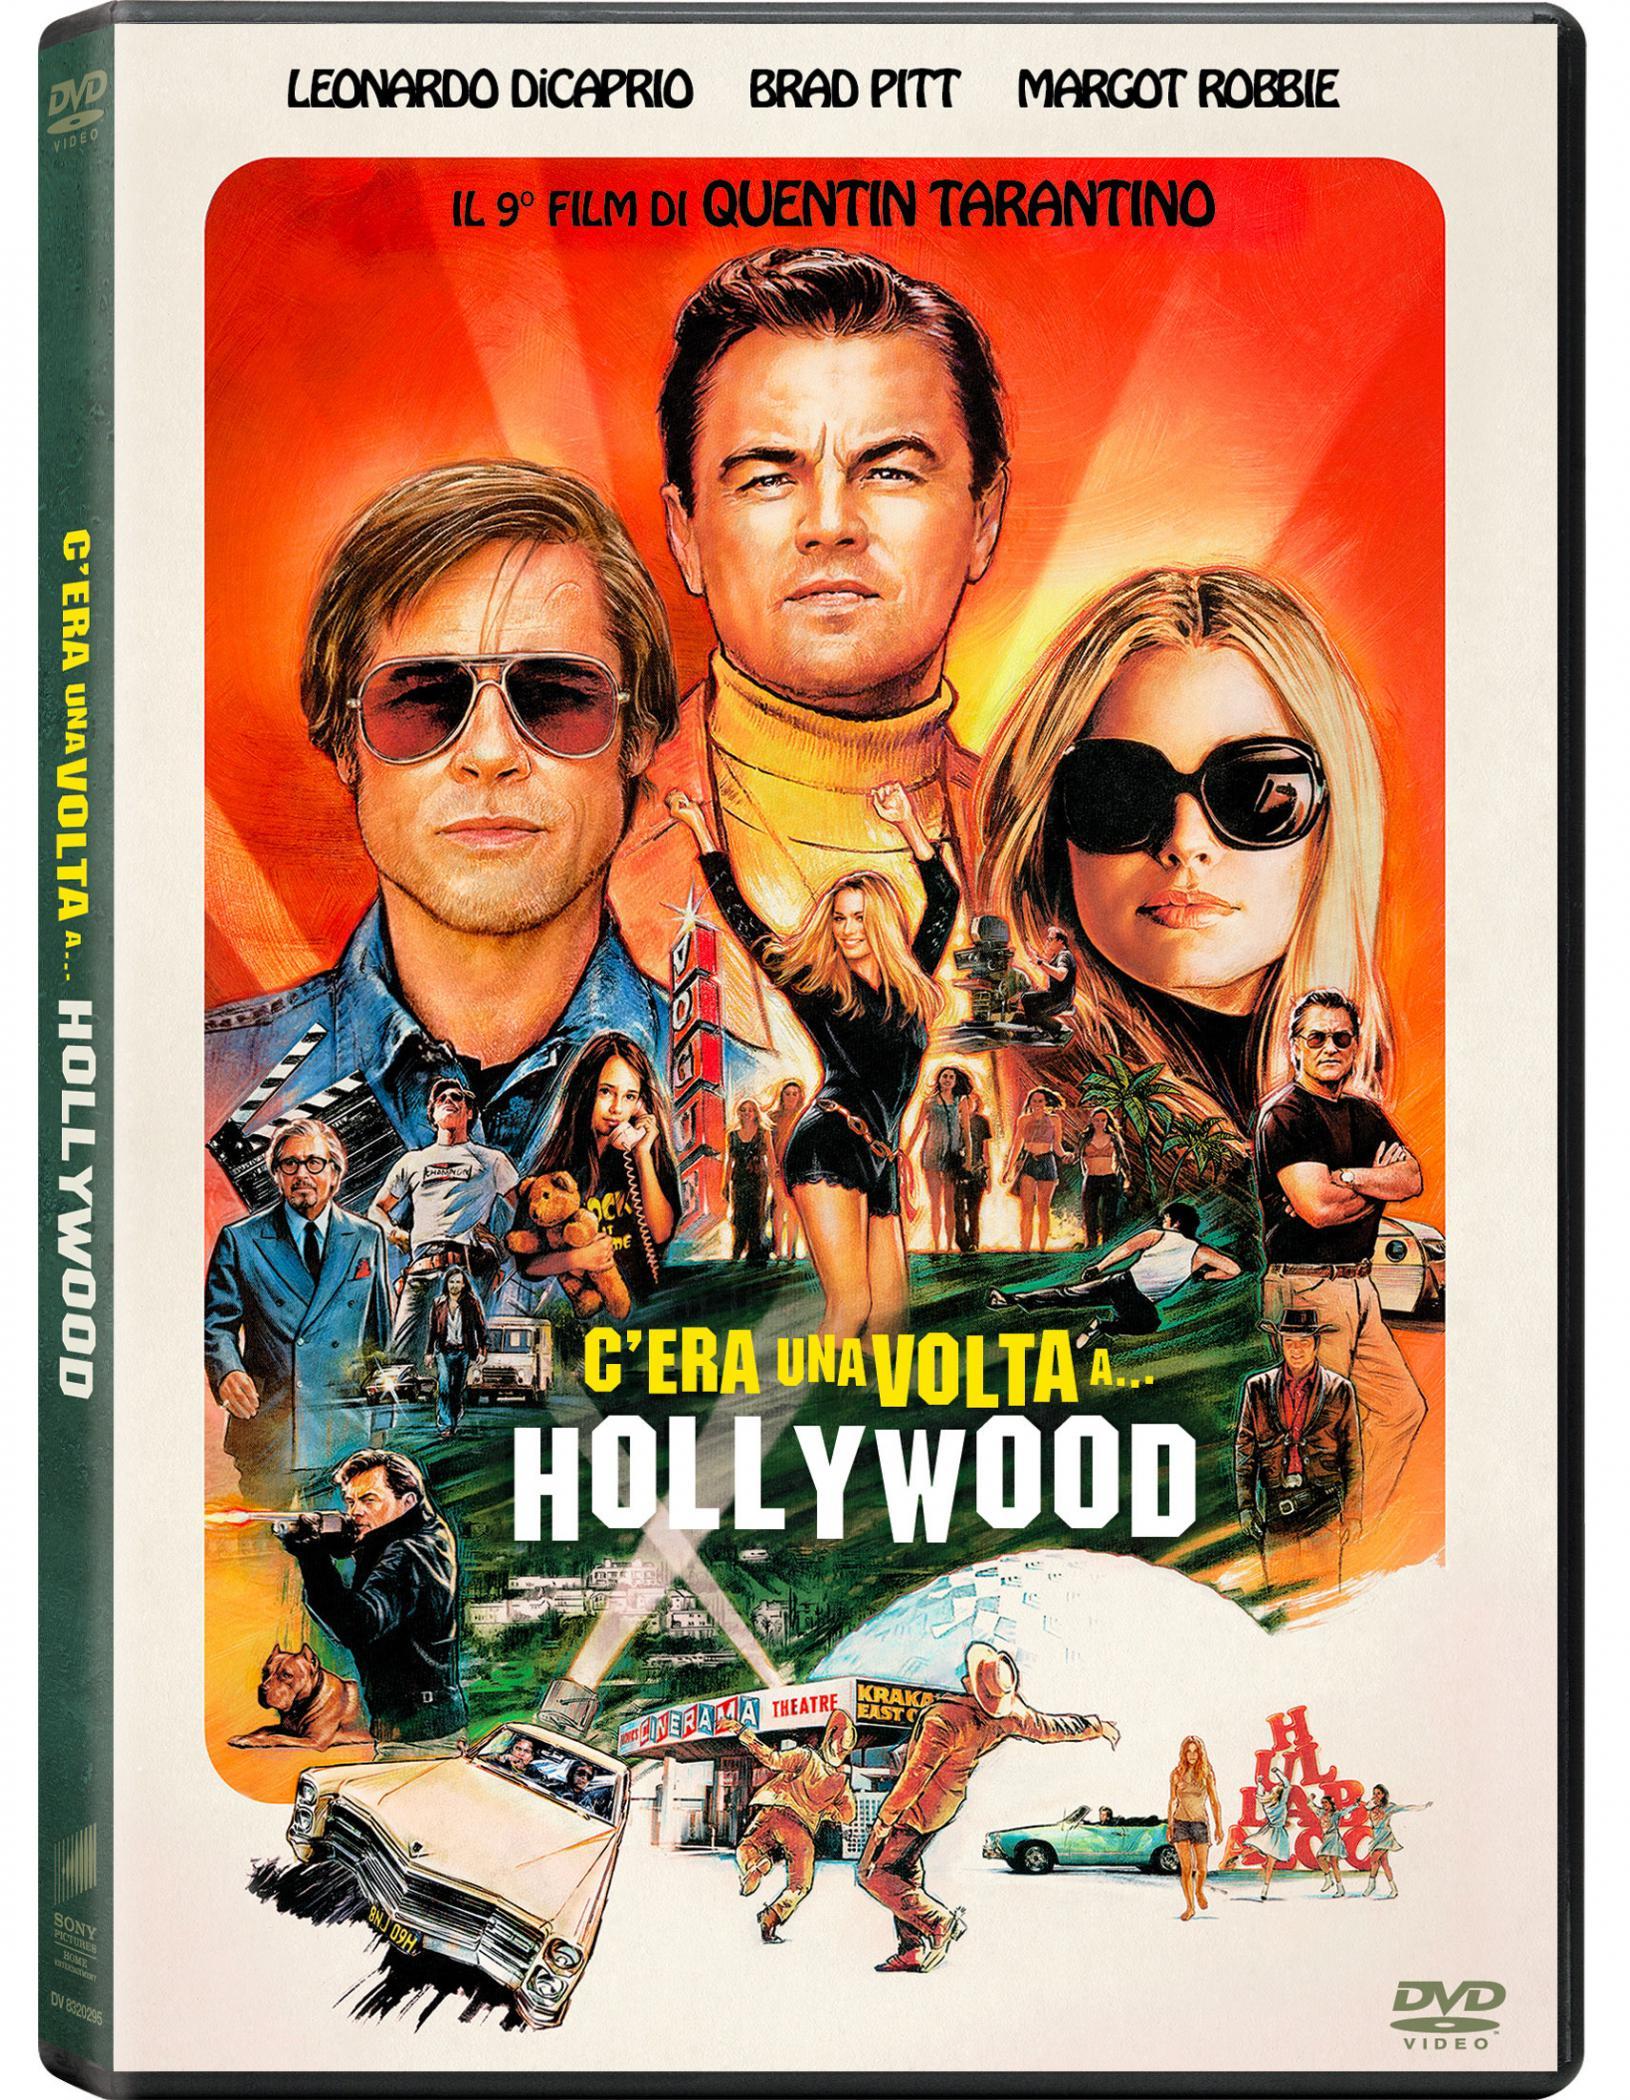 C'era una volta a…Hollywood  in In Dvd, Blu-ray, Steelbook 4k Ultra HD  Digital HD